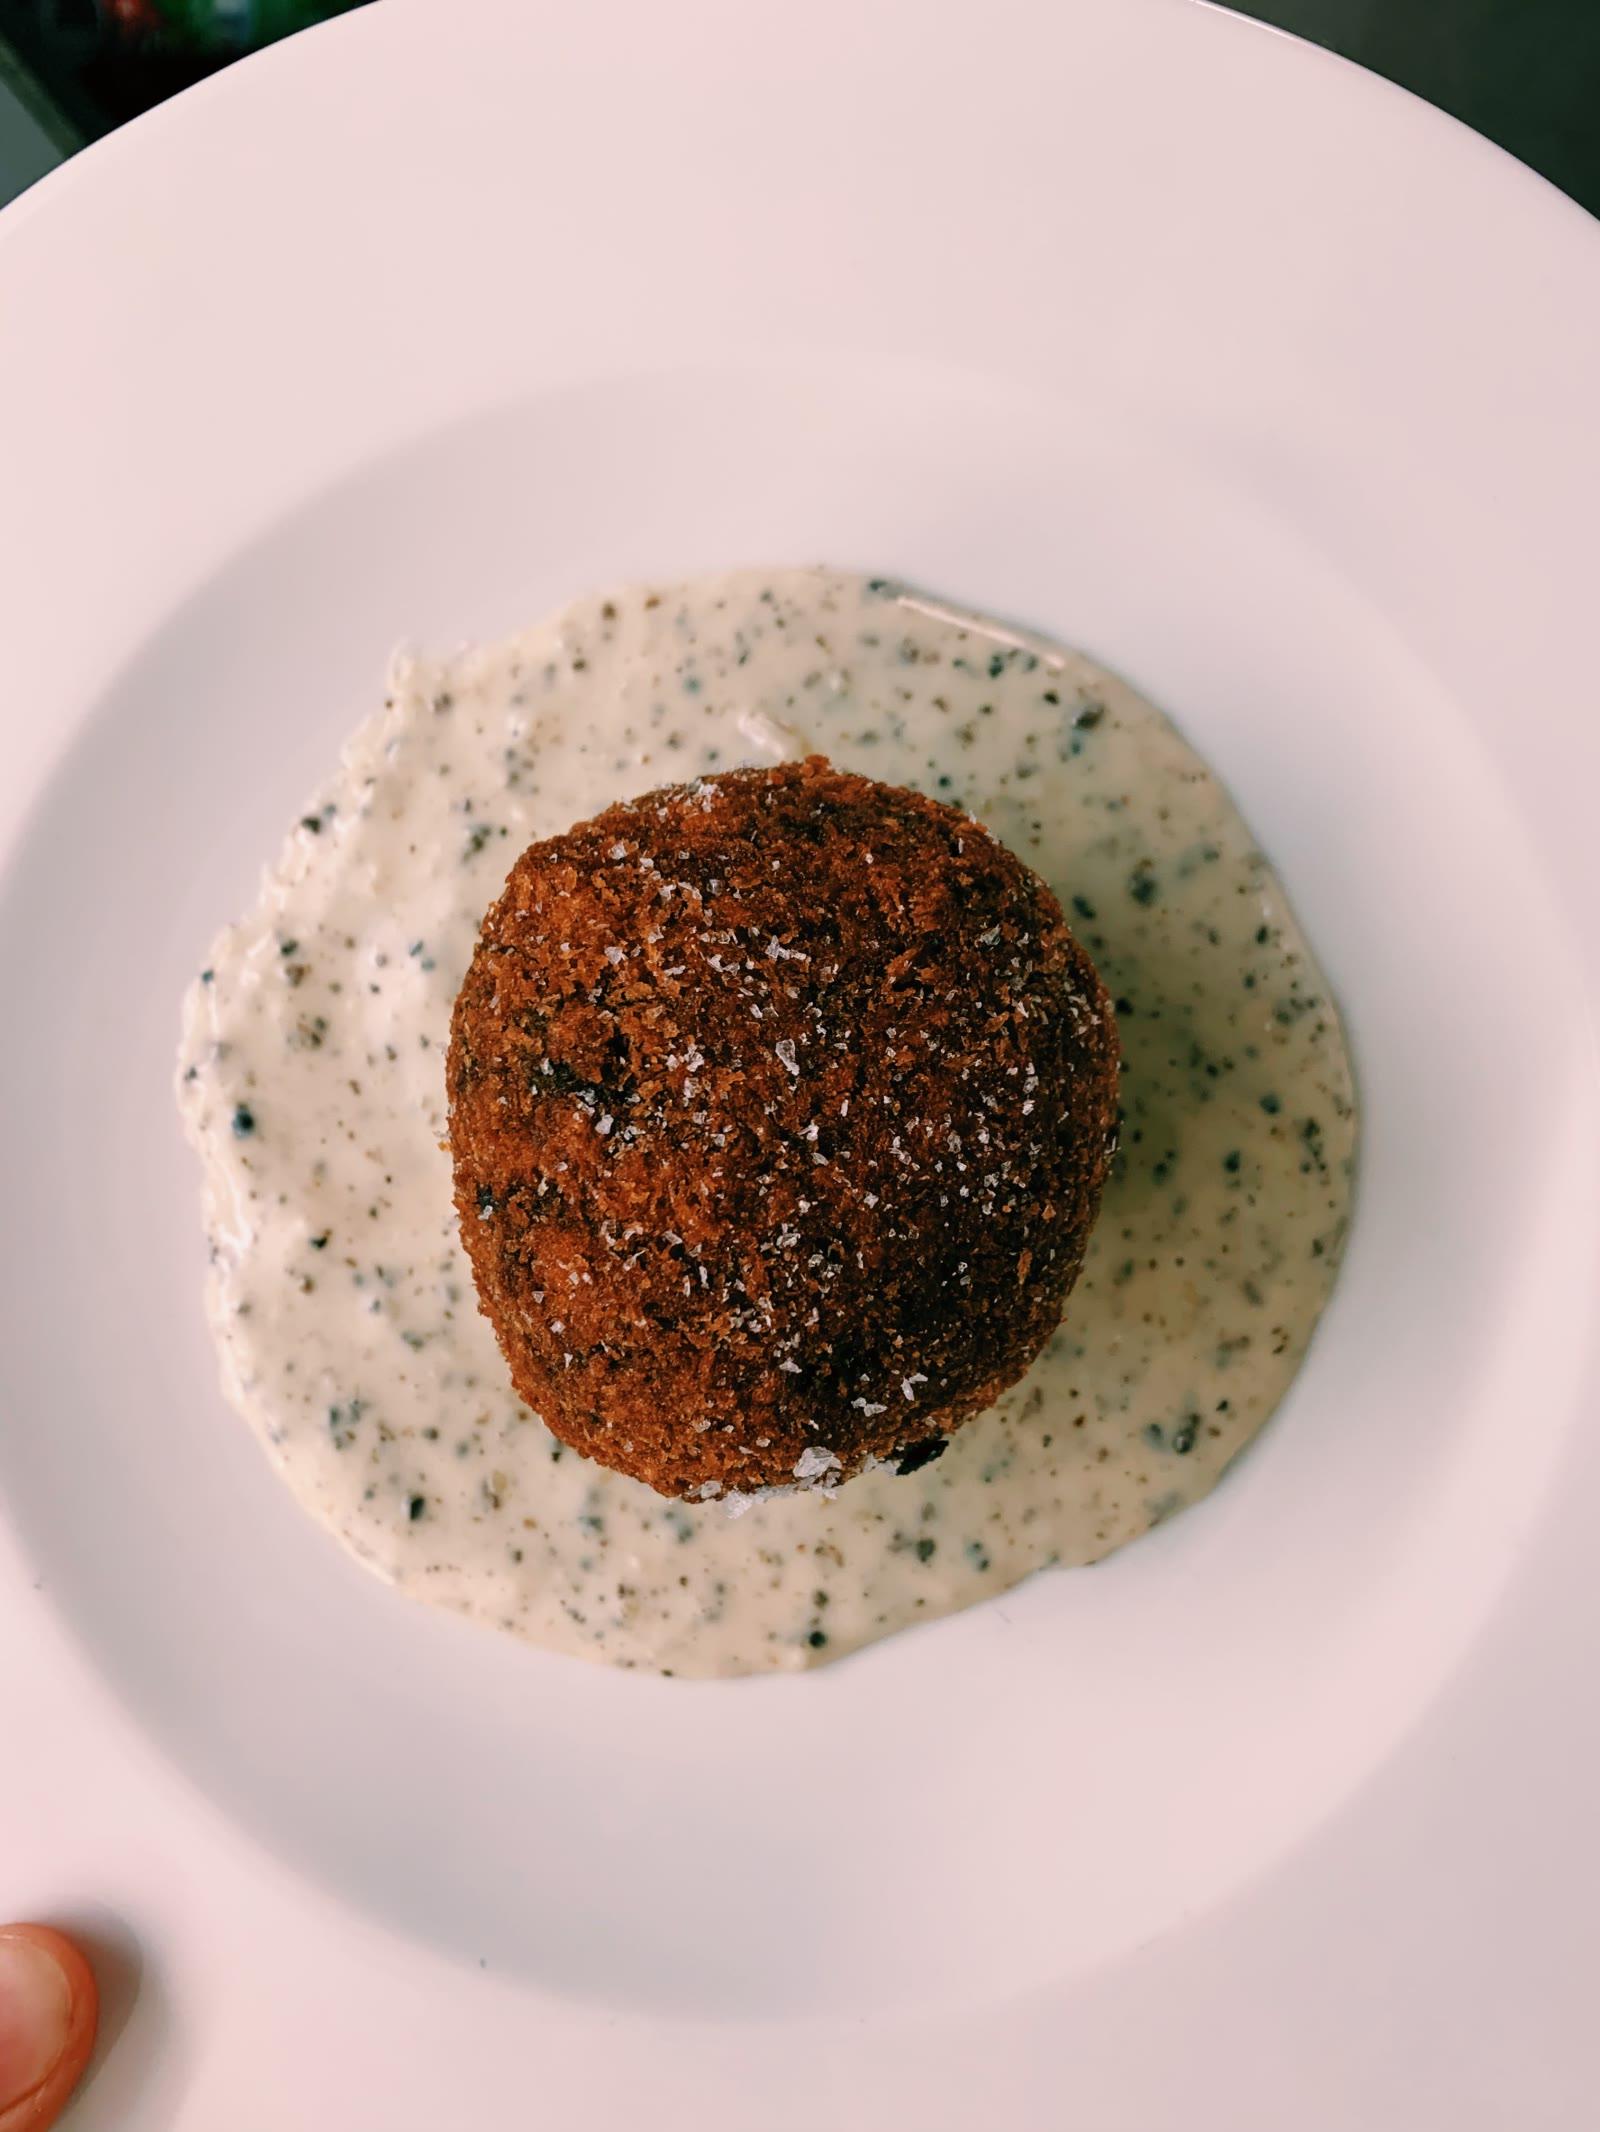 Wild Mushroom Arancini with Truffle Sauce cut open